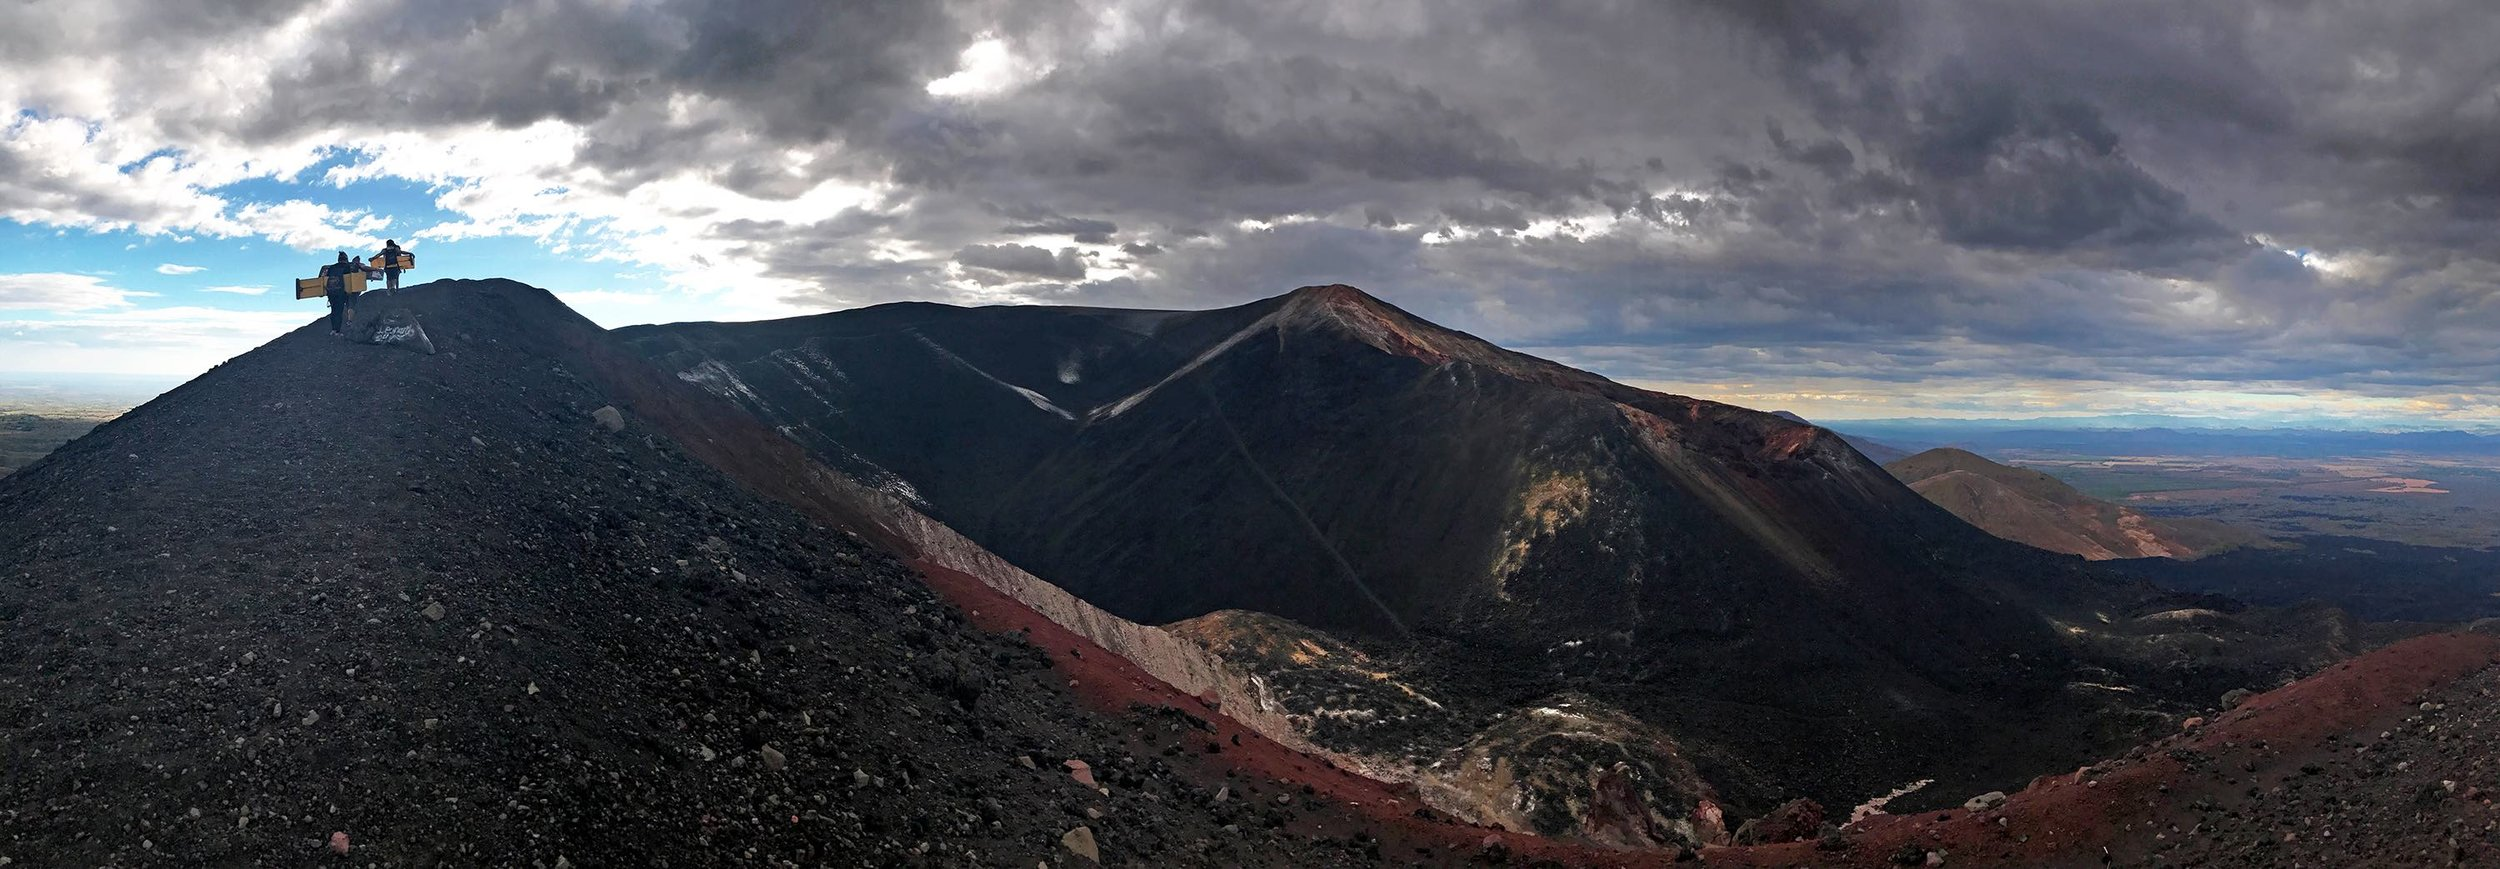 Cerro Negro volcano | Volcano hikes in Nicaragua